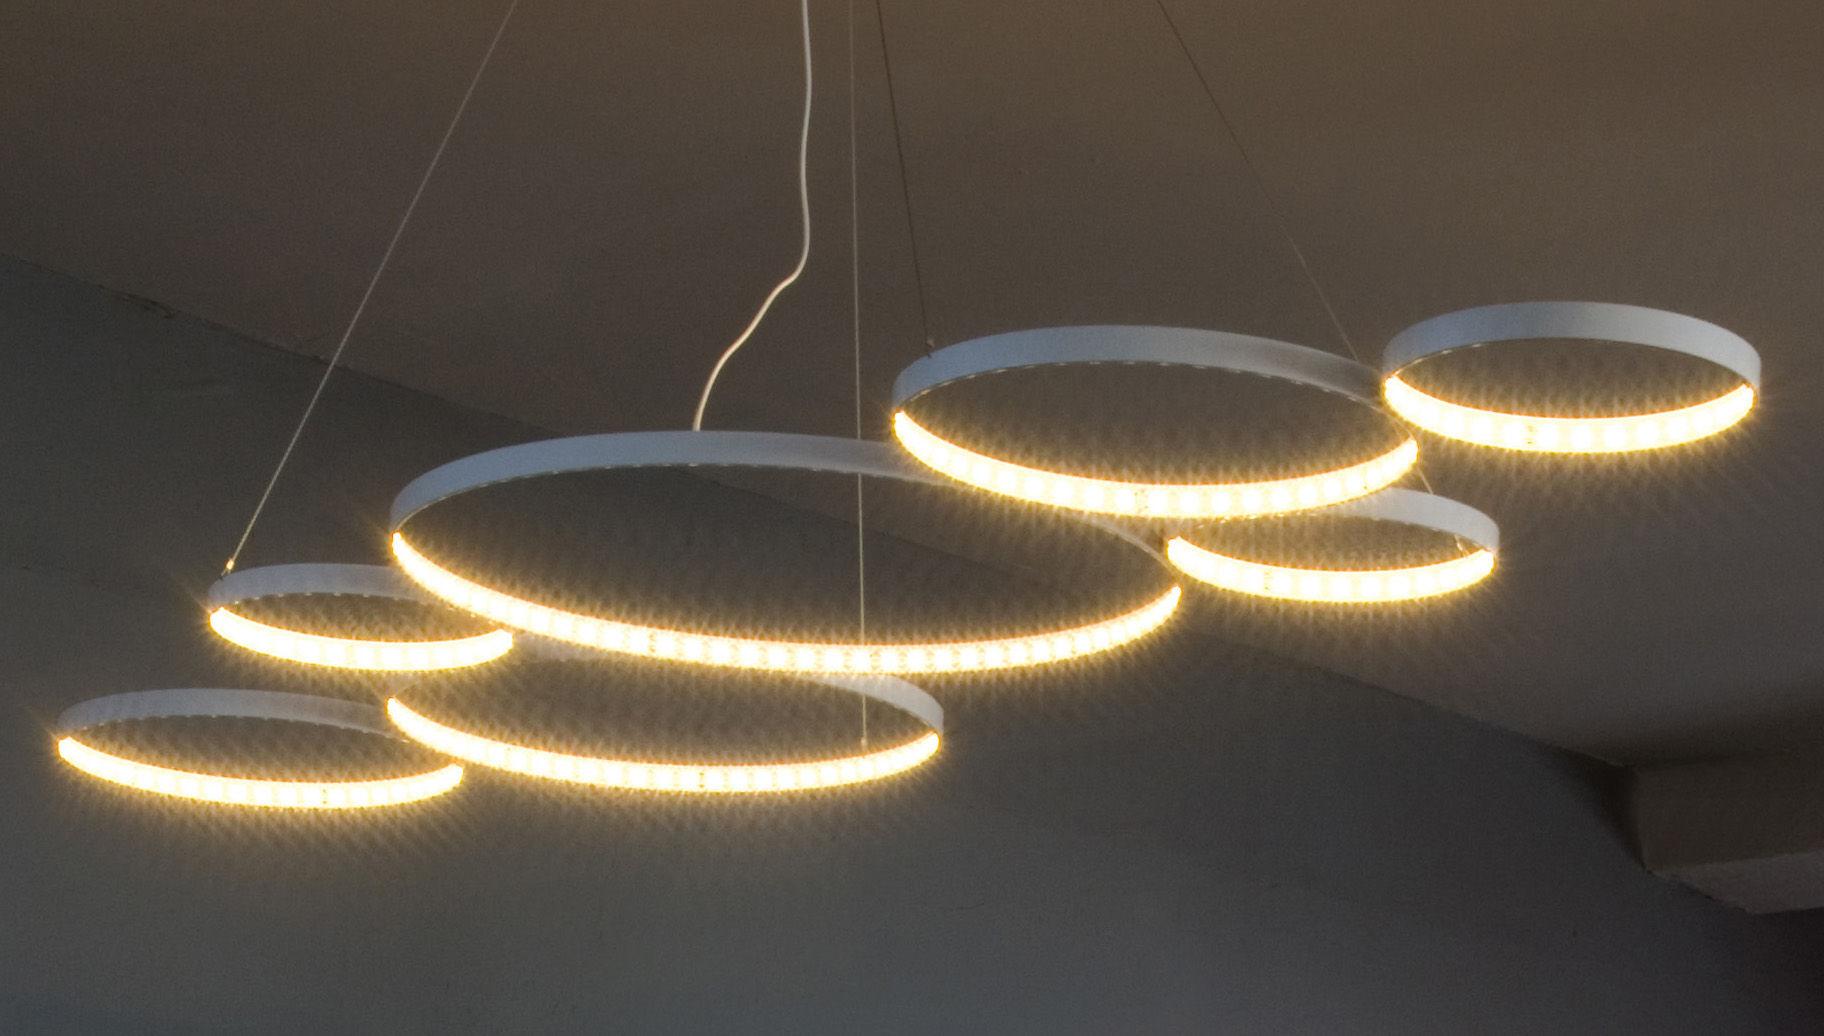 Leuchten - Pendelleuchten - Ultra8 Pendelleuchte / LED - 180 x 50 cm - Le Deun - Weiß - Stahl